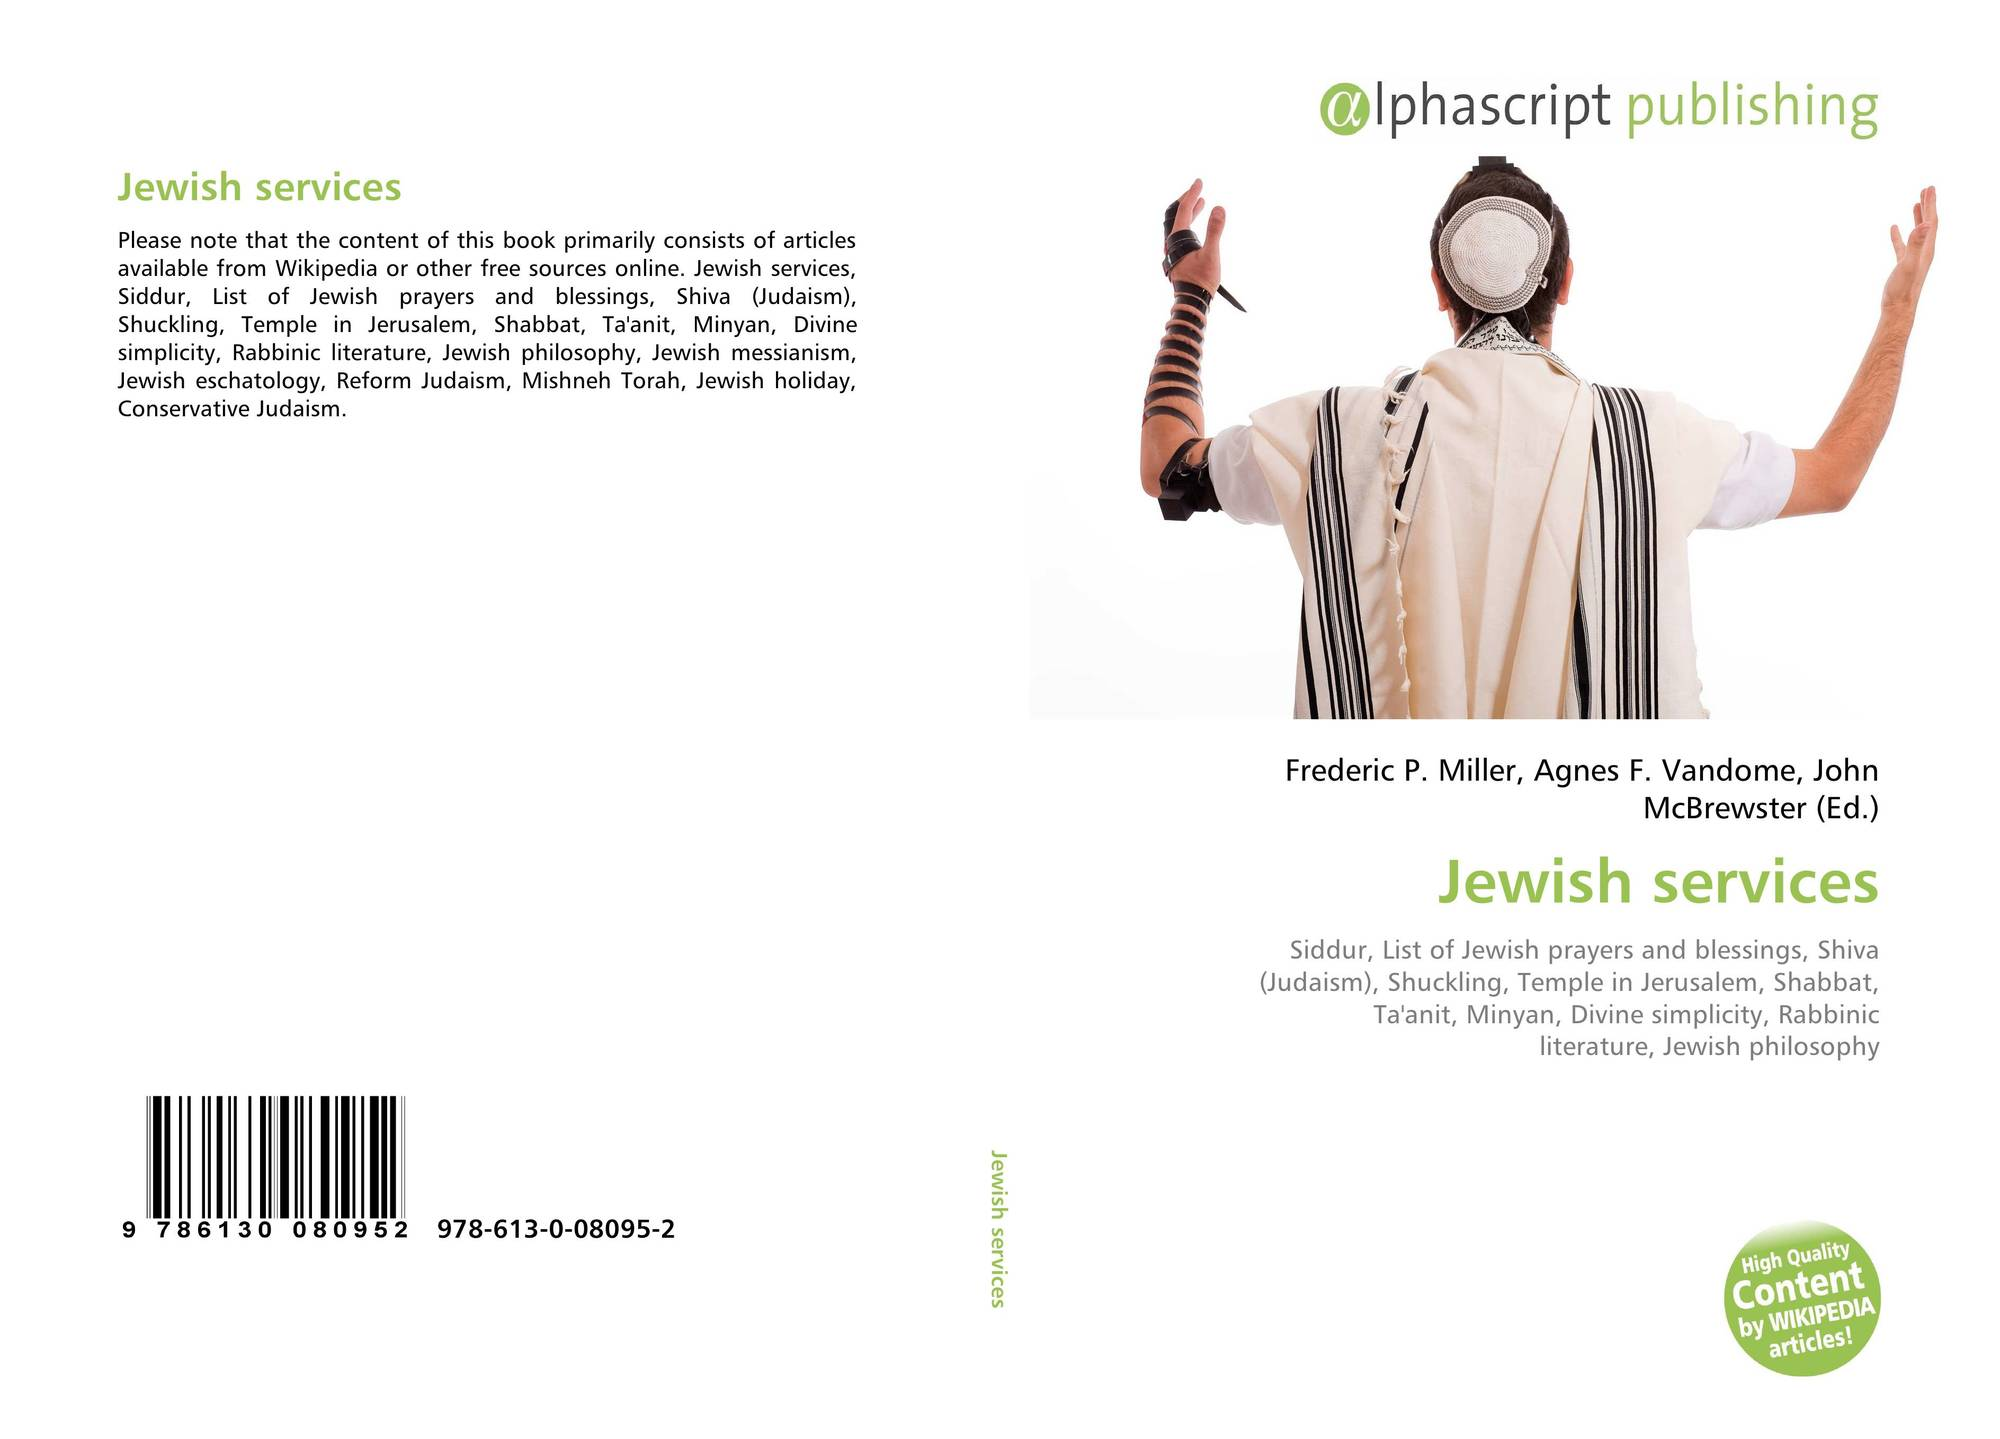 Jewish services, 978-613-0-08095-2, 6130080956 ,9786130080952